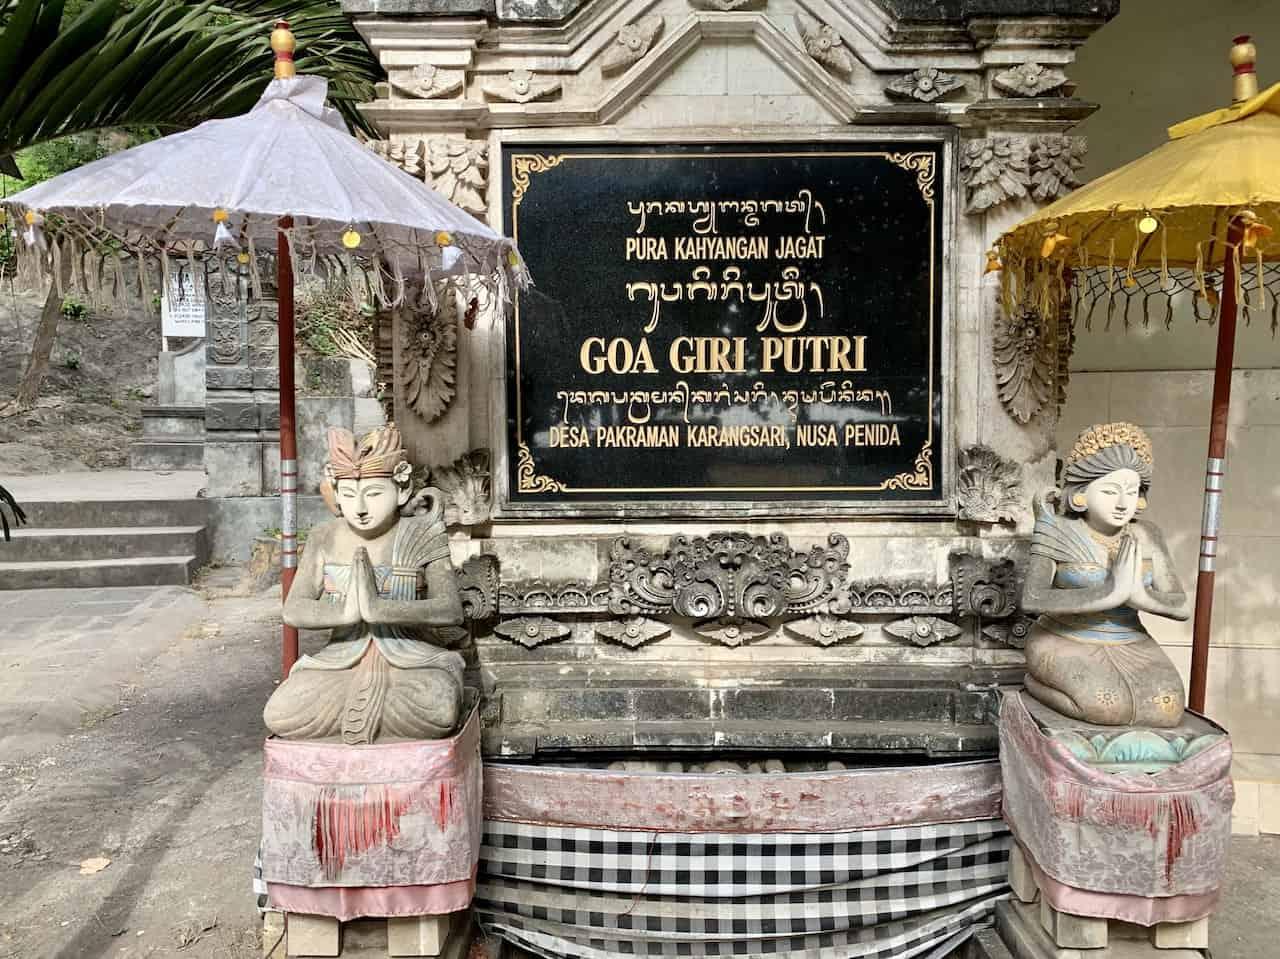 Goa Giri Putri Entrance